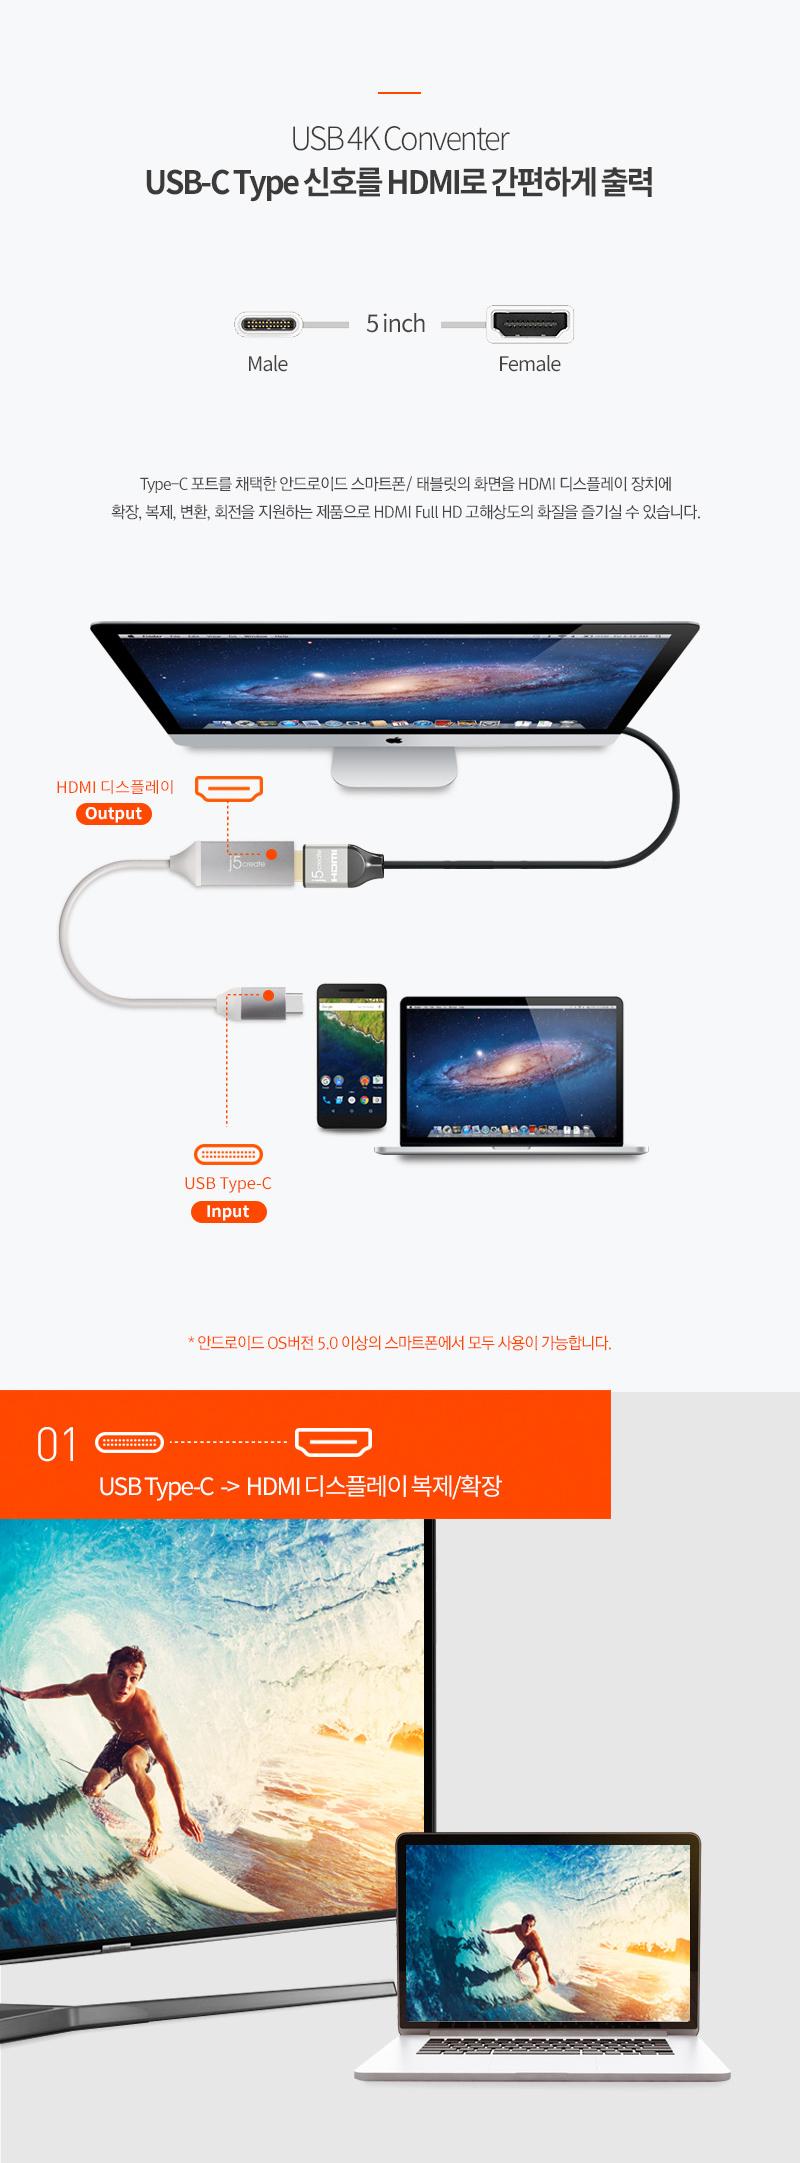 j5create  USB Type C to HDMI 컨버터 (JCA153G)